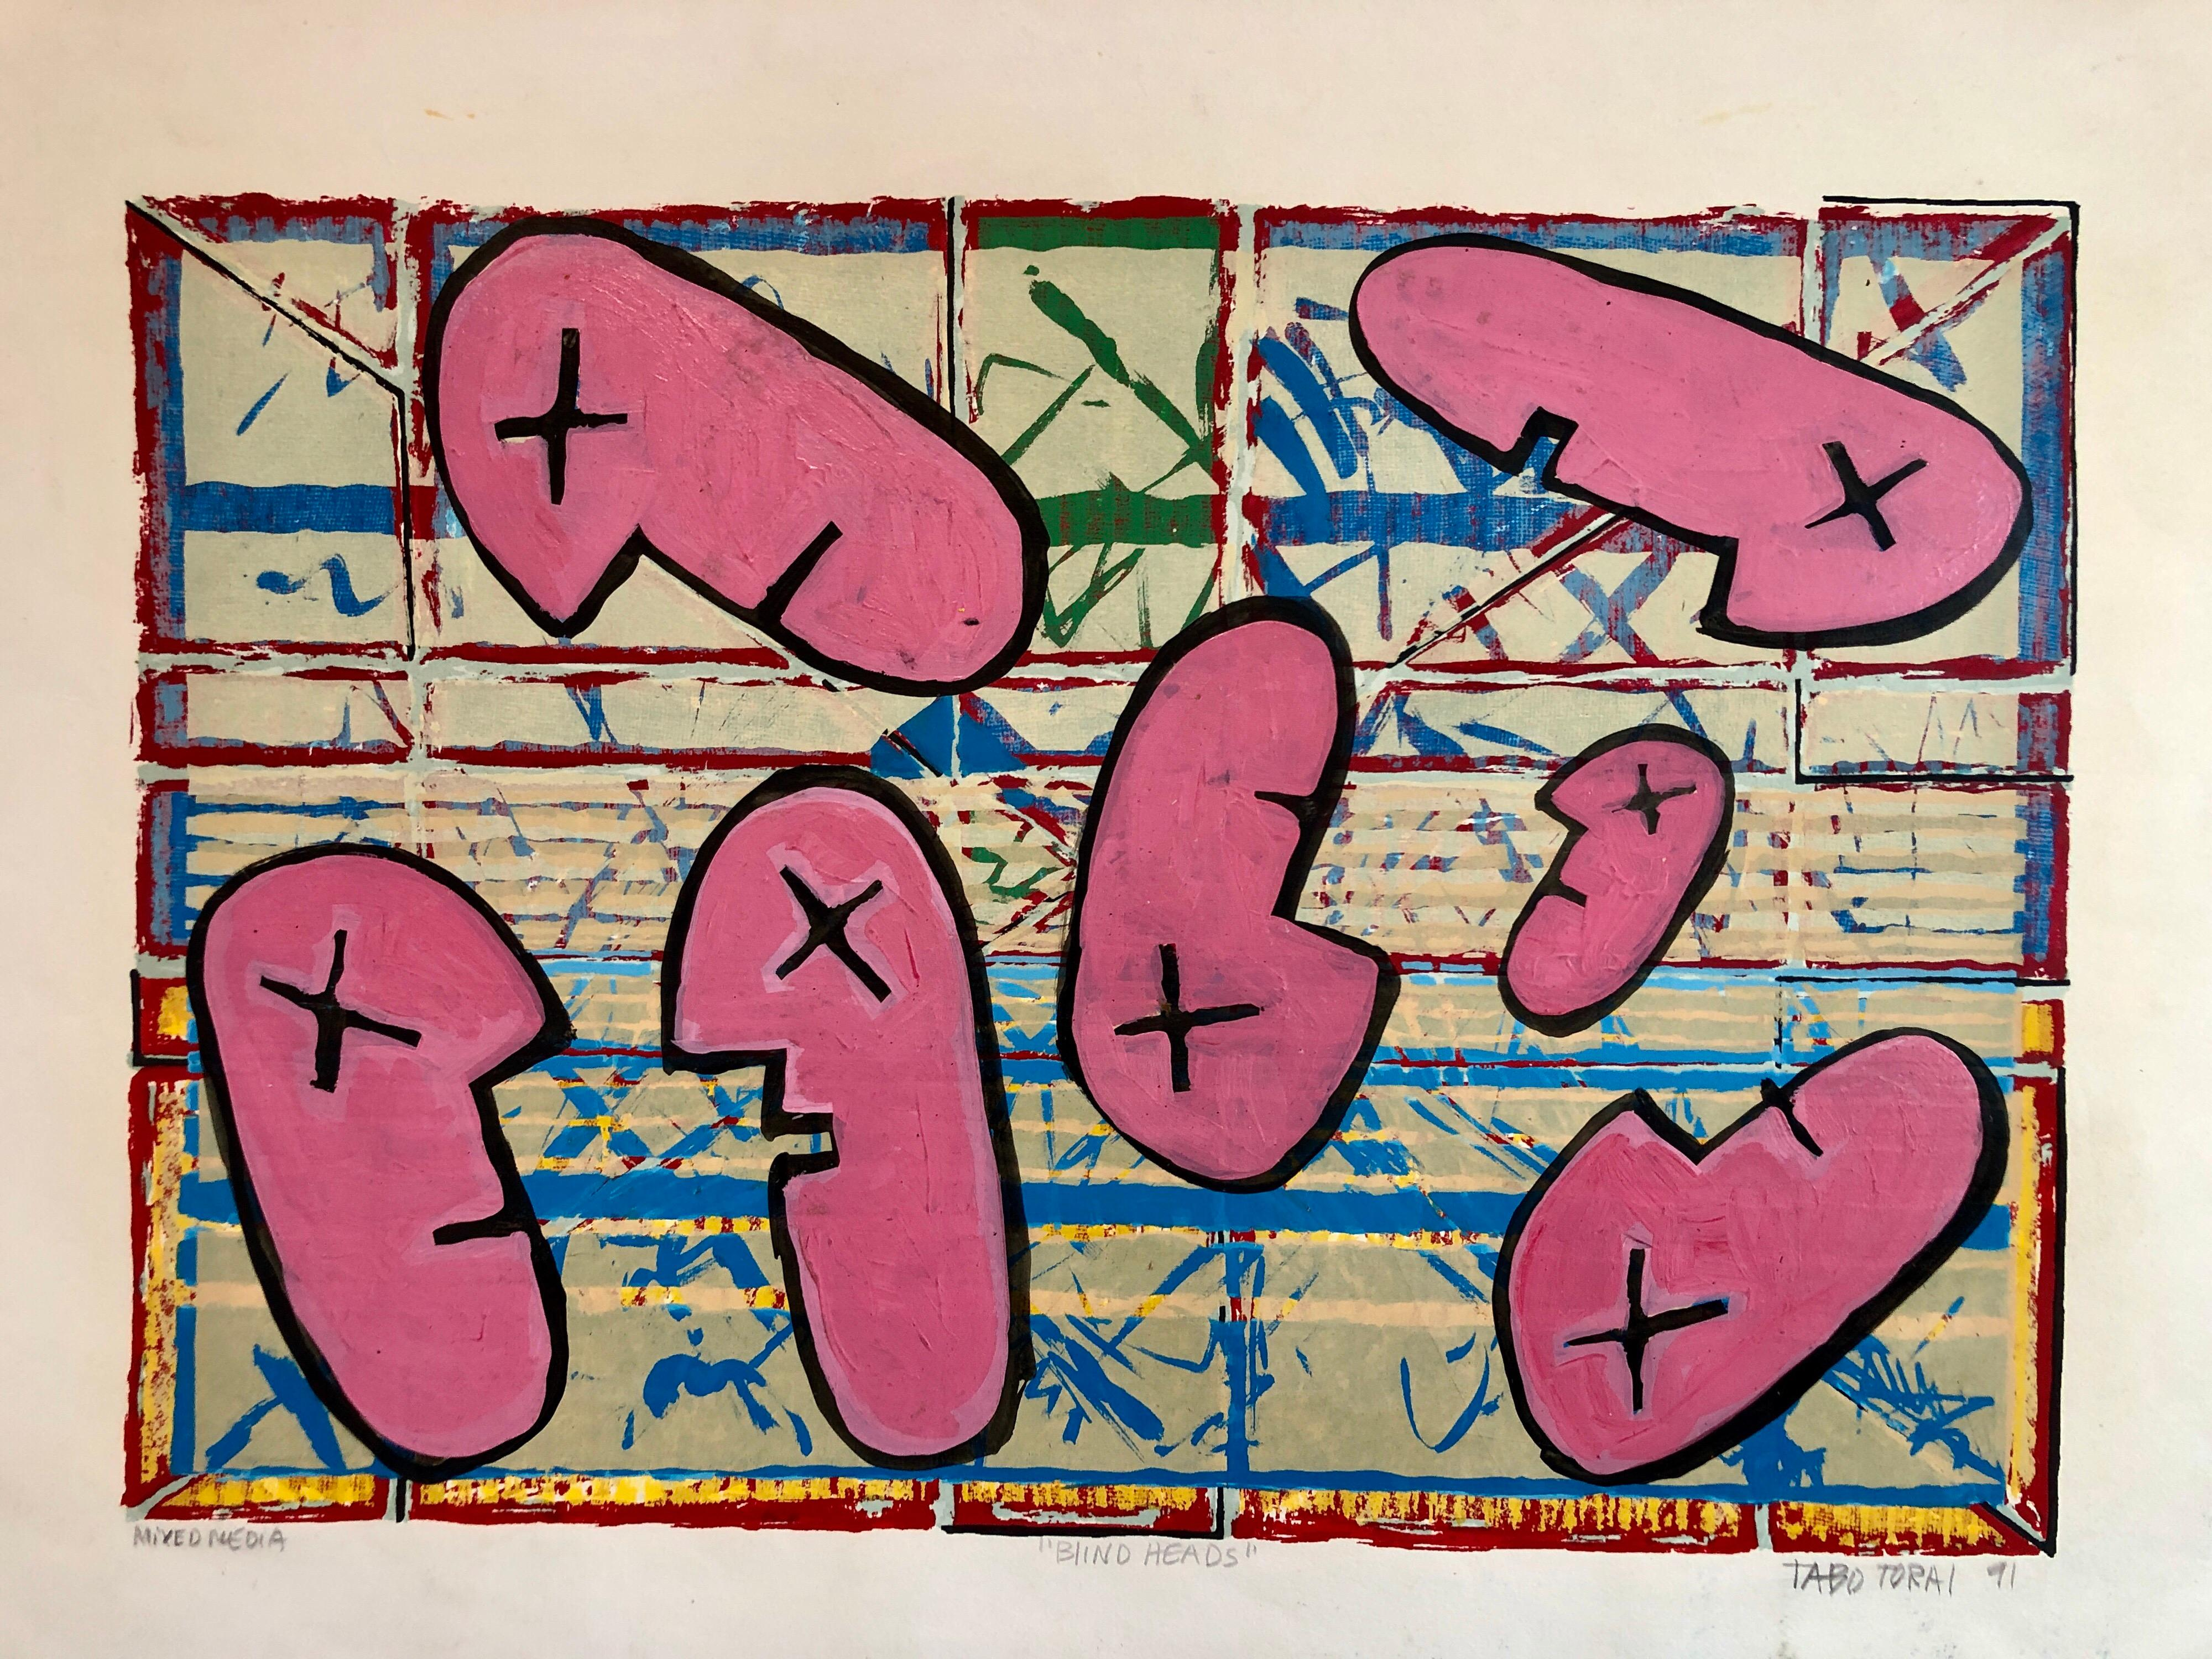 1990's Graffiti Artist. Mixed Media Painting Bold Colorful New Wave NYC Panama